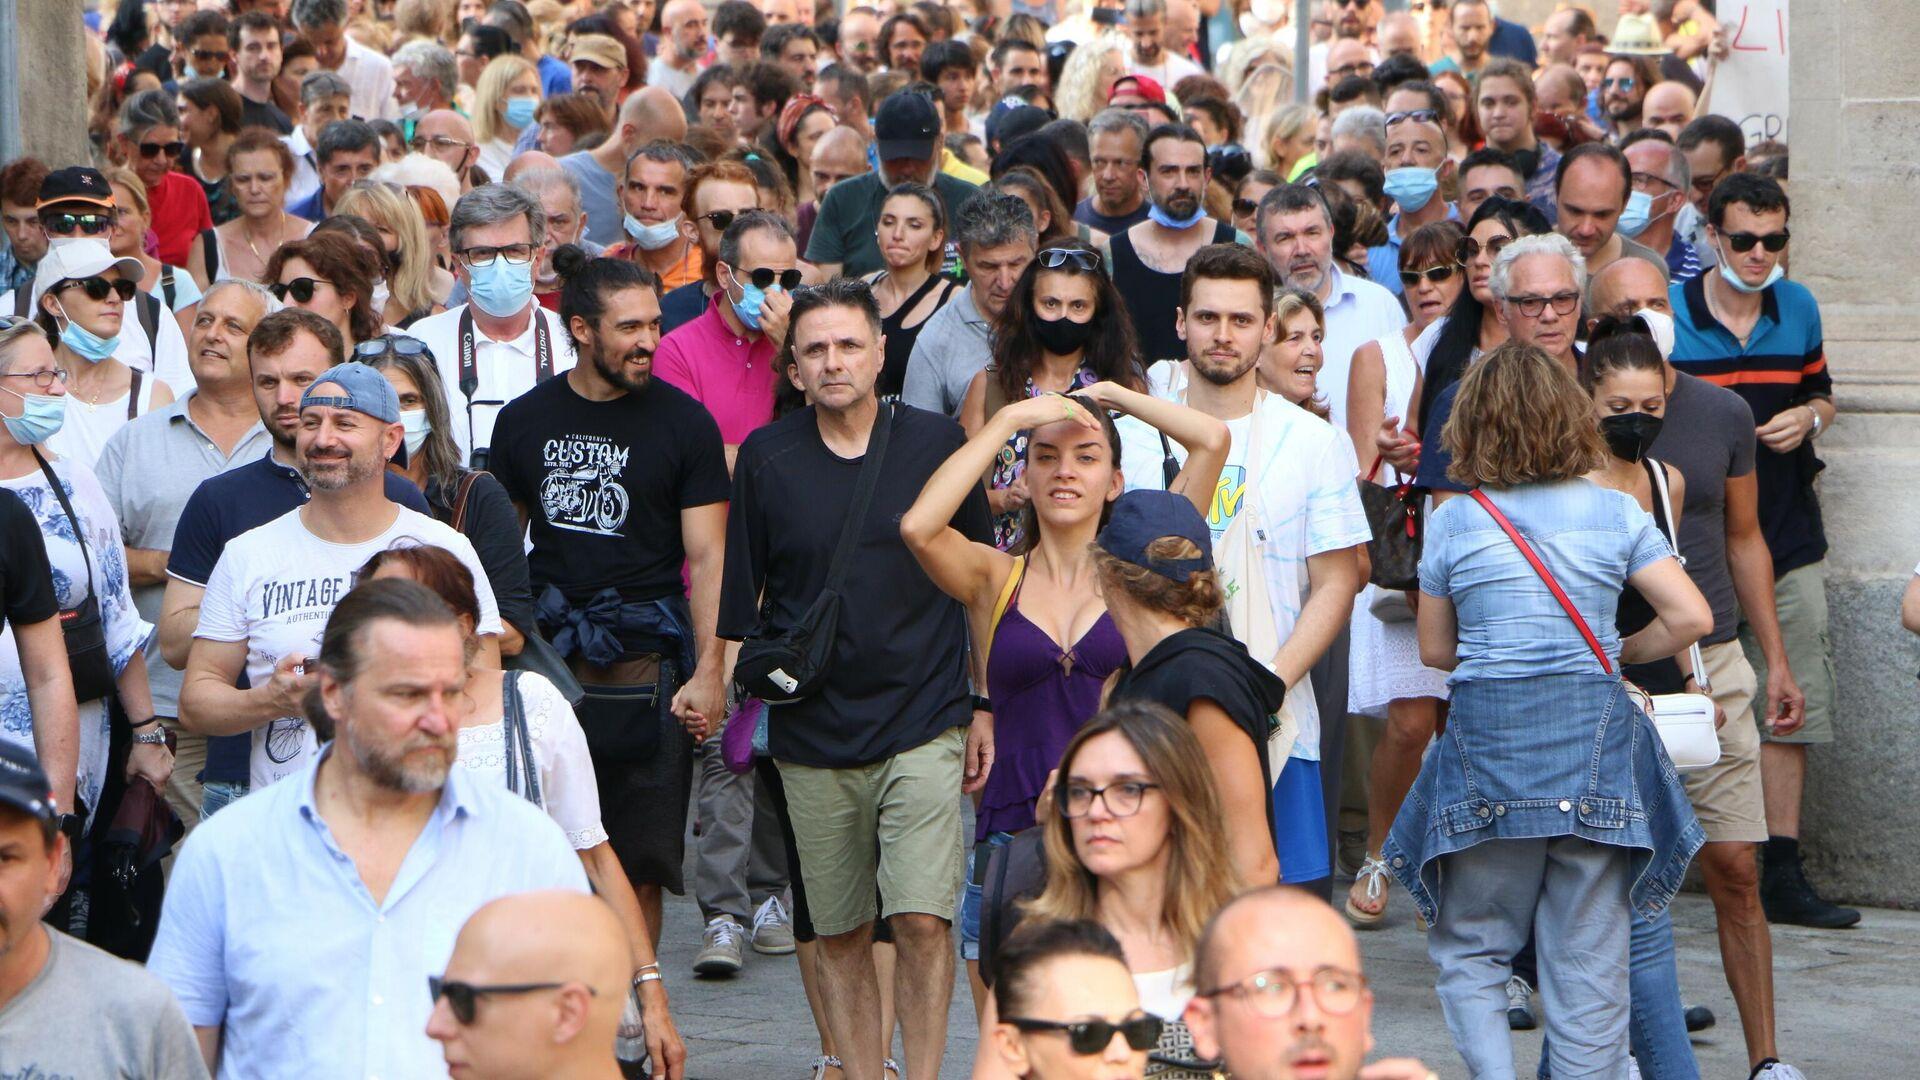 Manifestazione No green pass a Milano - Sputnik Italia, 1920, 27.07.2021